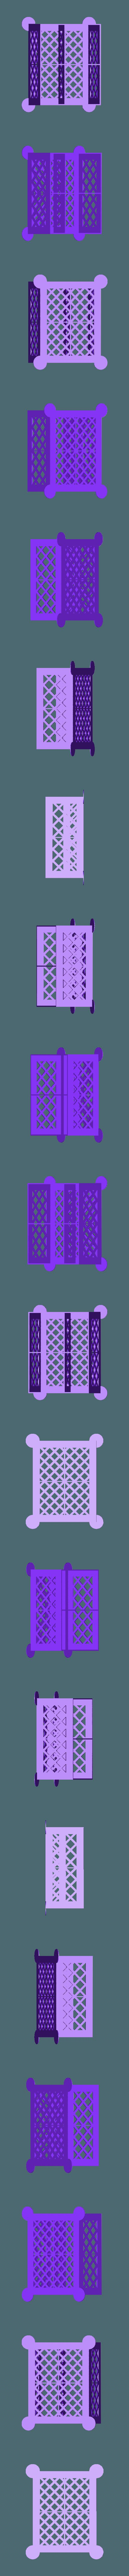 NightTerrors.stl Download free STL file Shadows of brimstone box organizer • 3D print object, gthanatos